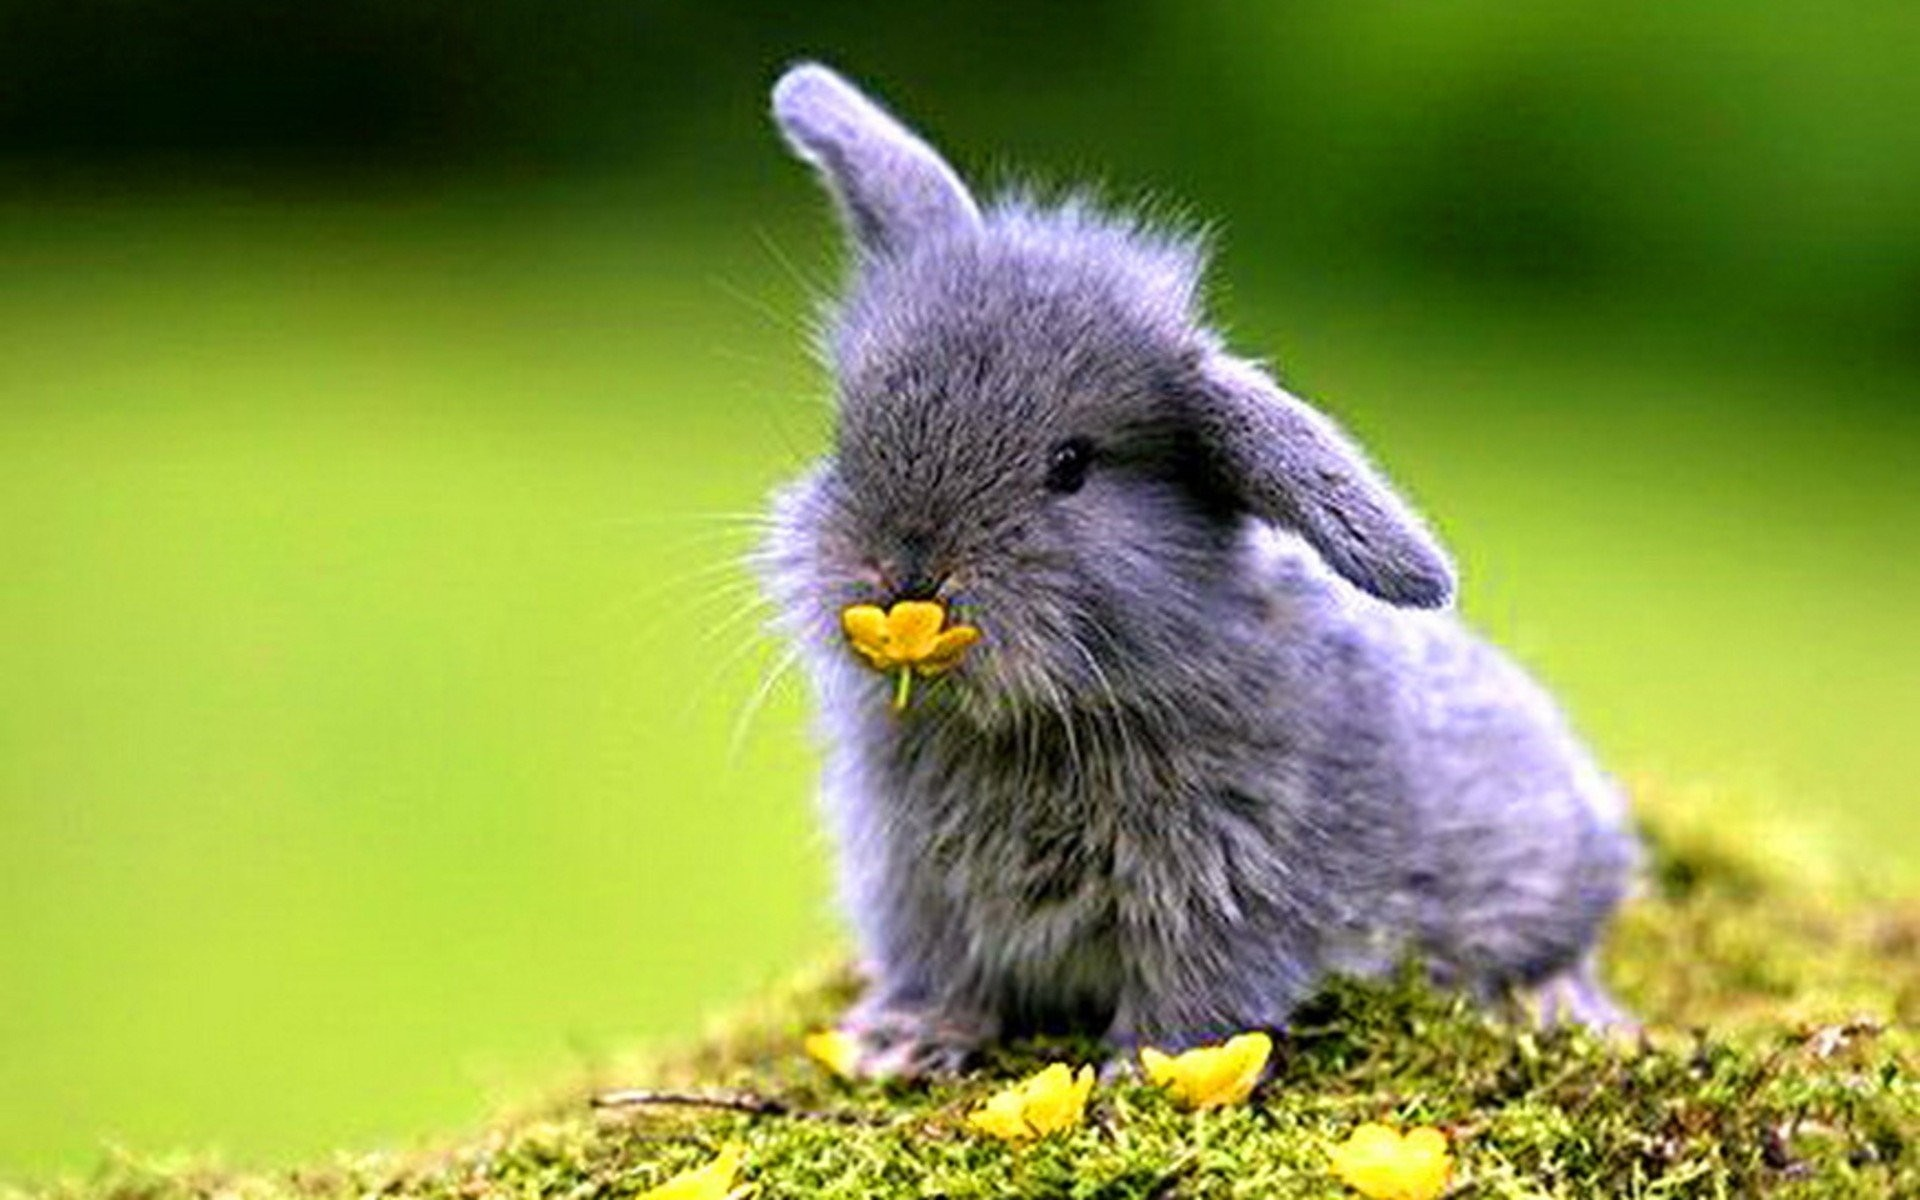 … baby bunny wallpaper wallpapersafari; rabbits wallpaper other animals  …